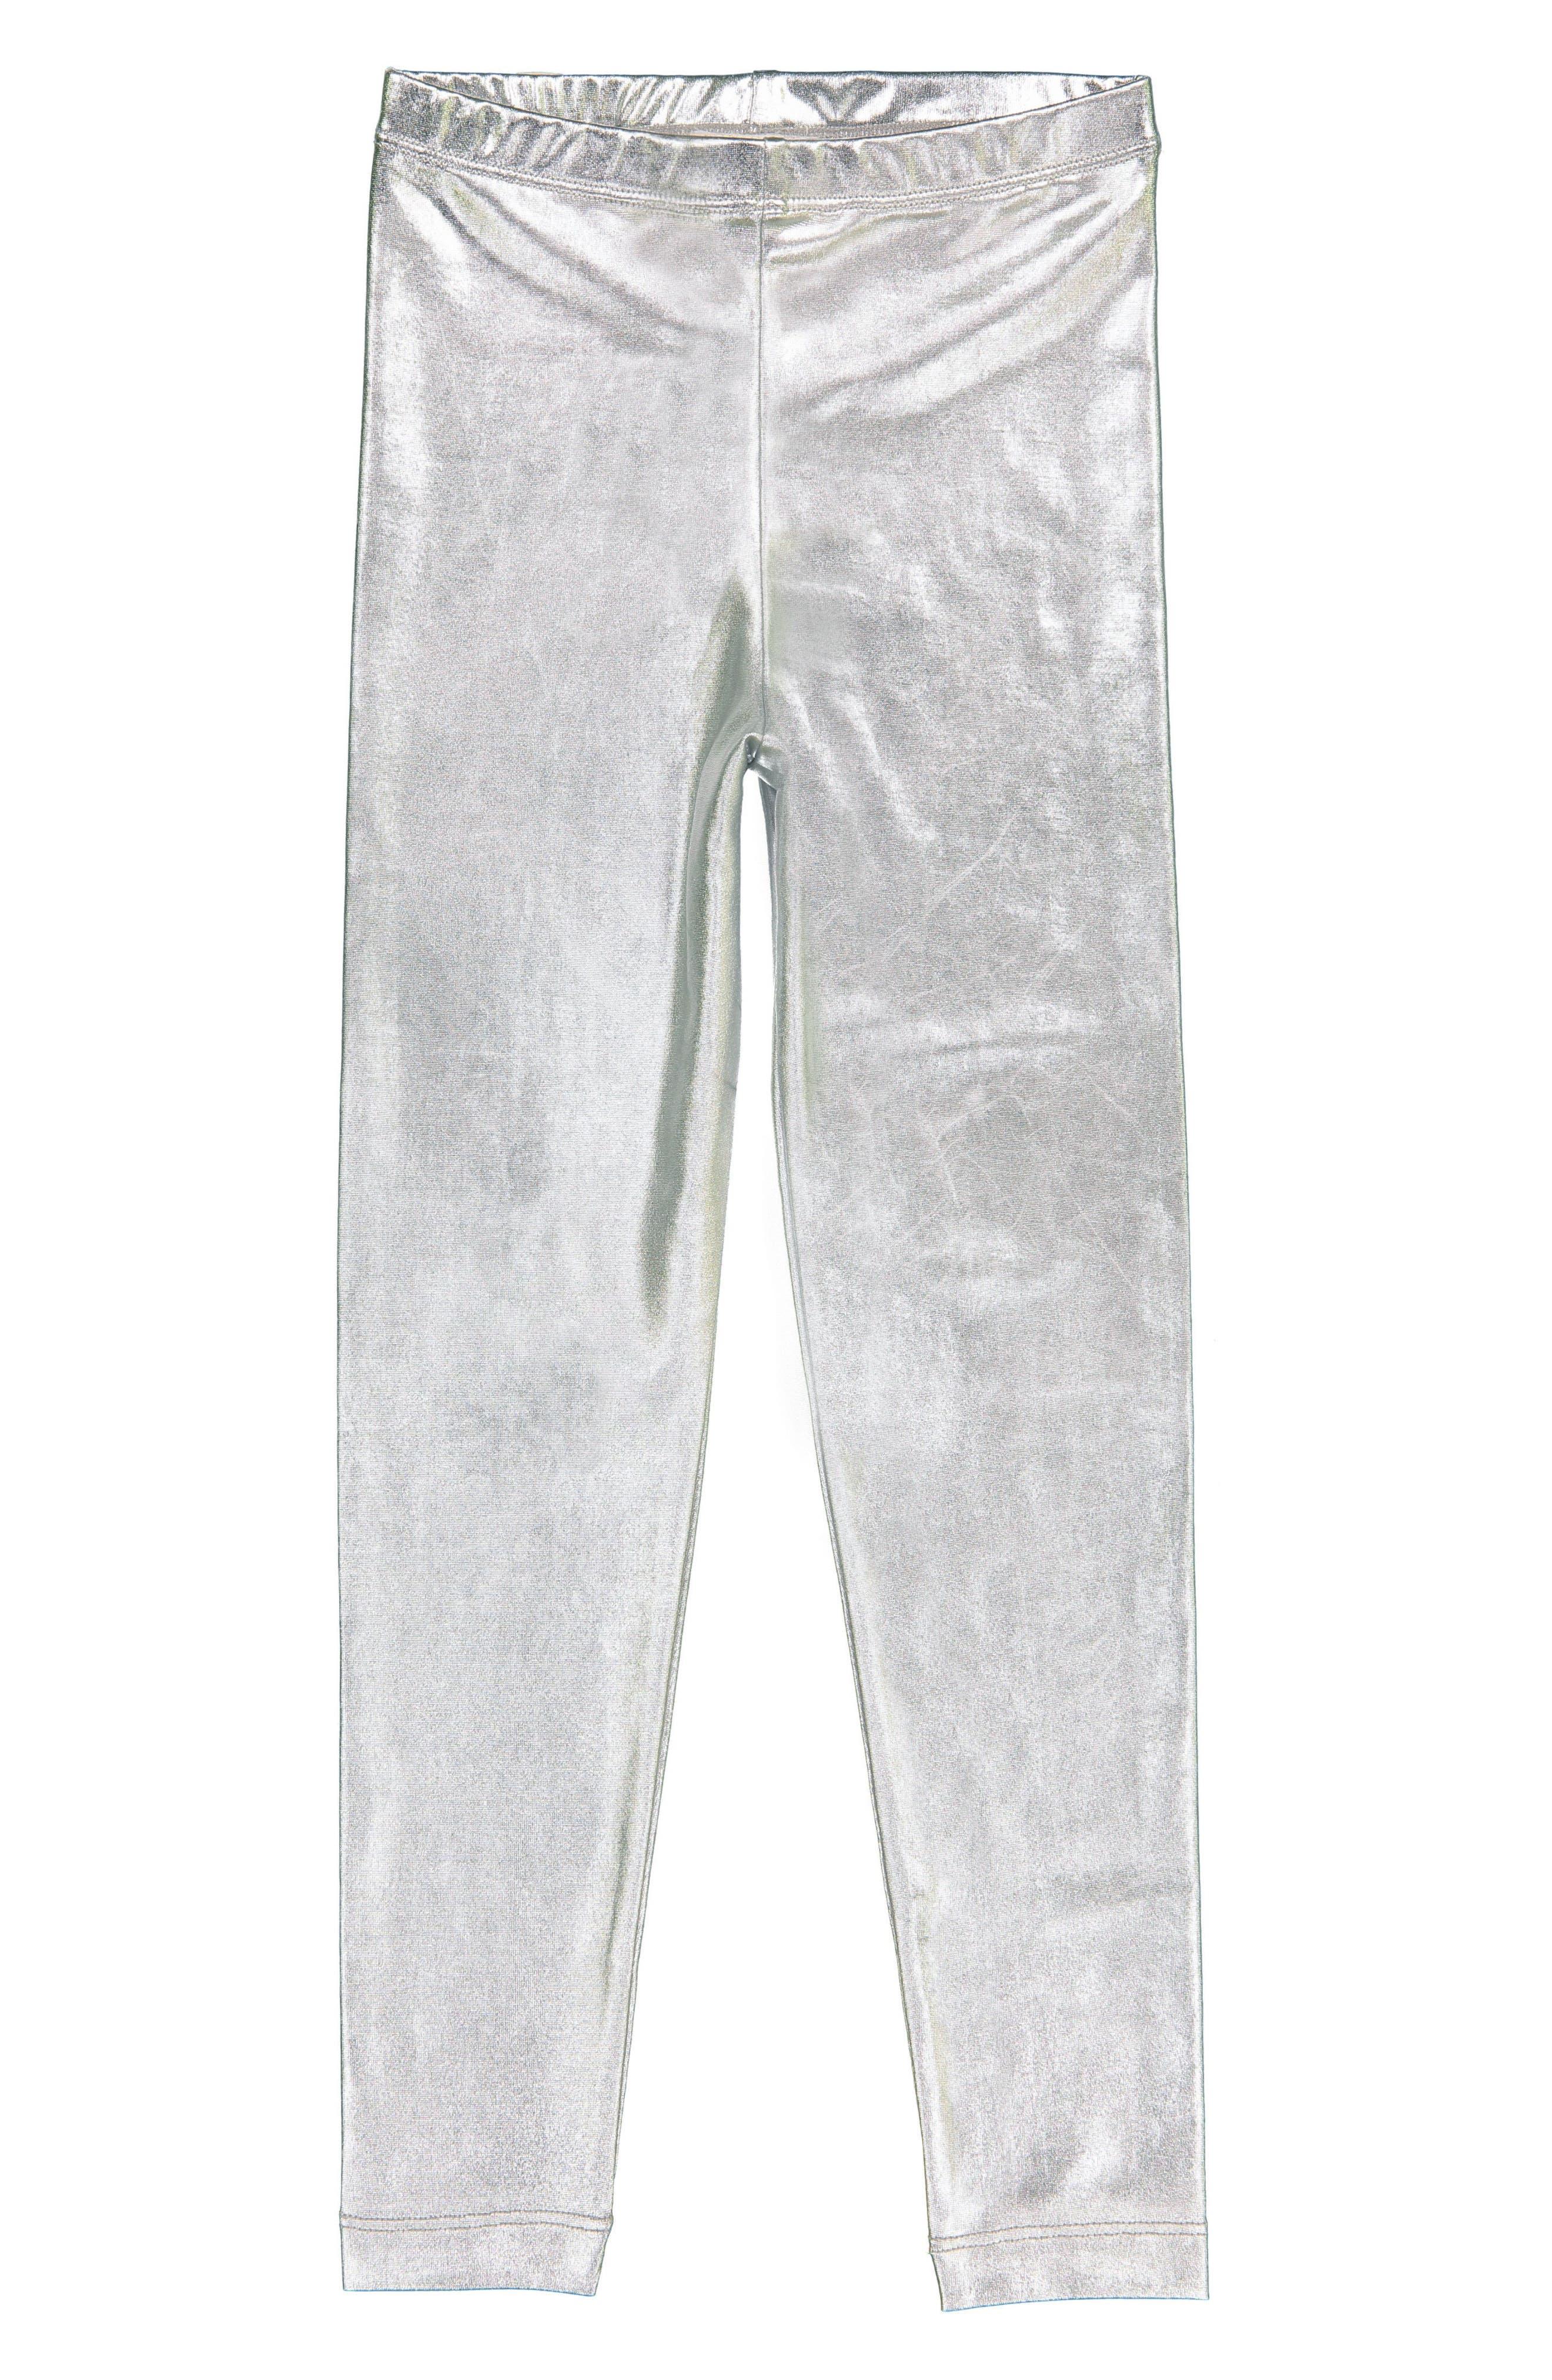 Silver Metallic Leggings,                             Main thumbnail 1, color,                             040